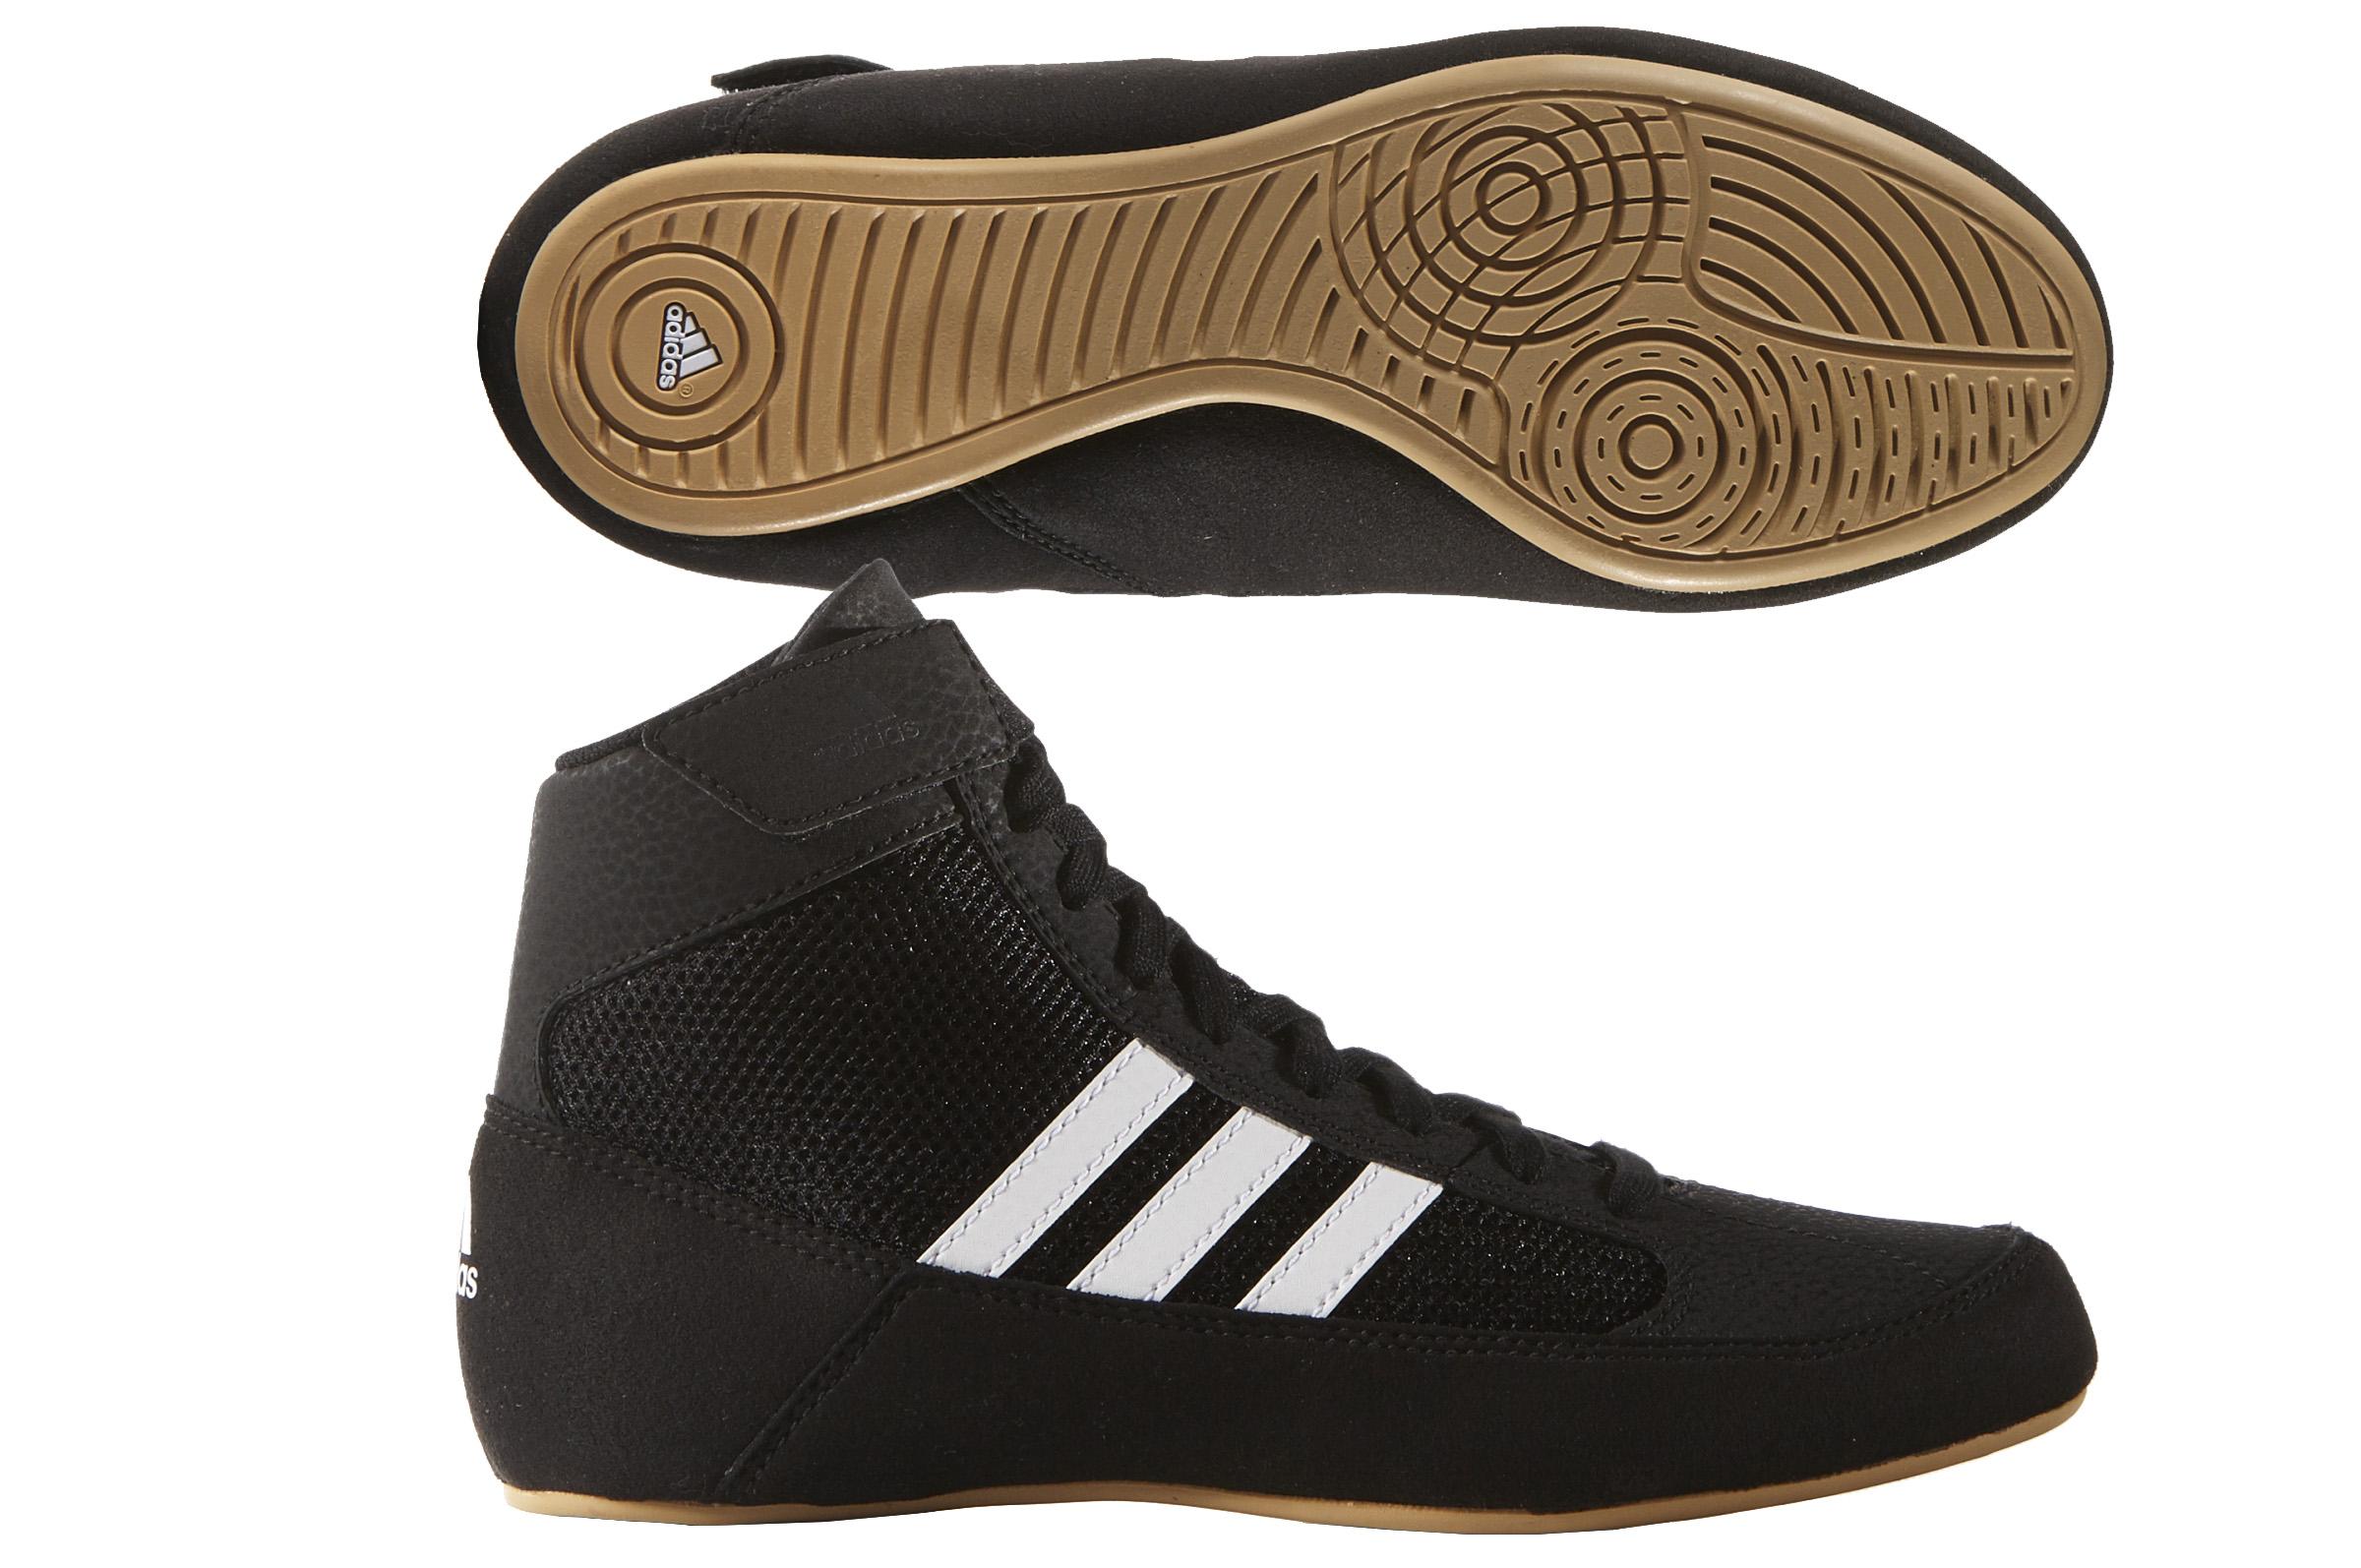 Adidas De Boxe Cher Et Pas Chaussure Savate Bf Française Chaussures vUaHf